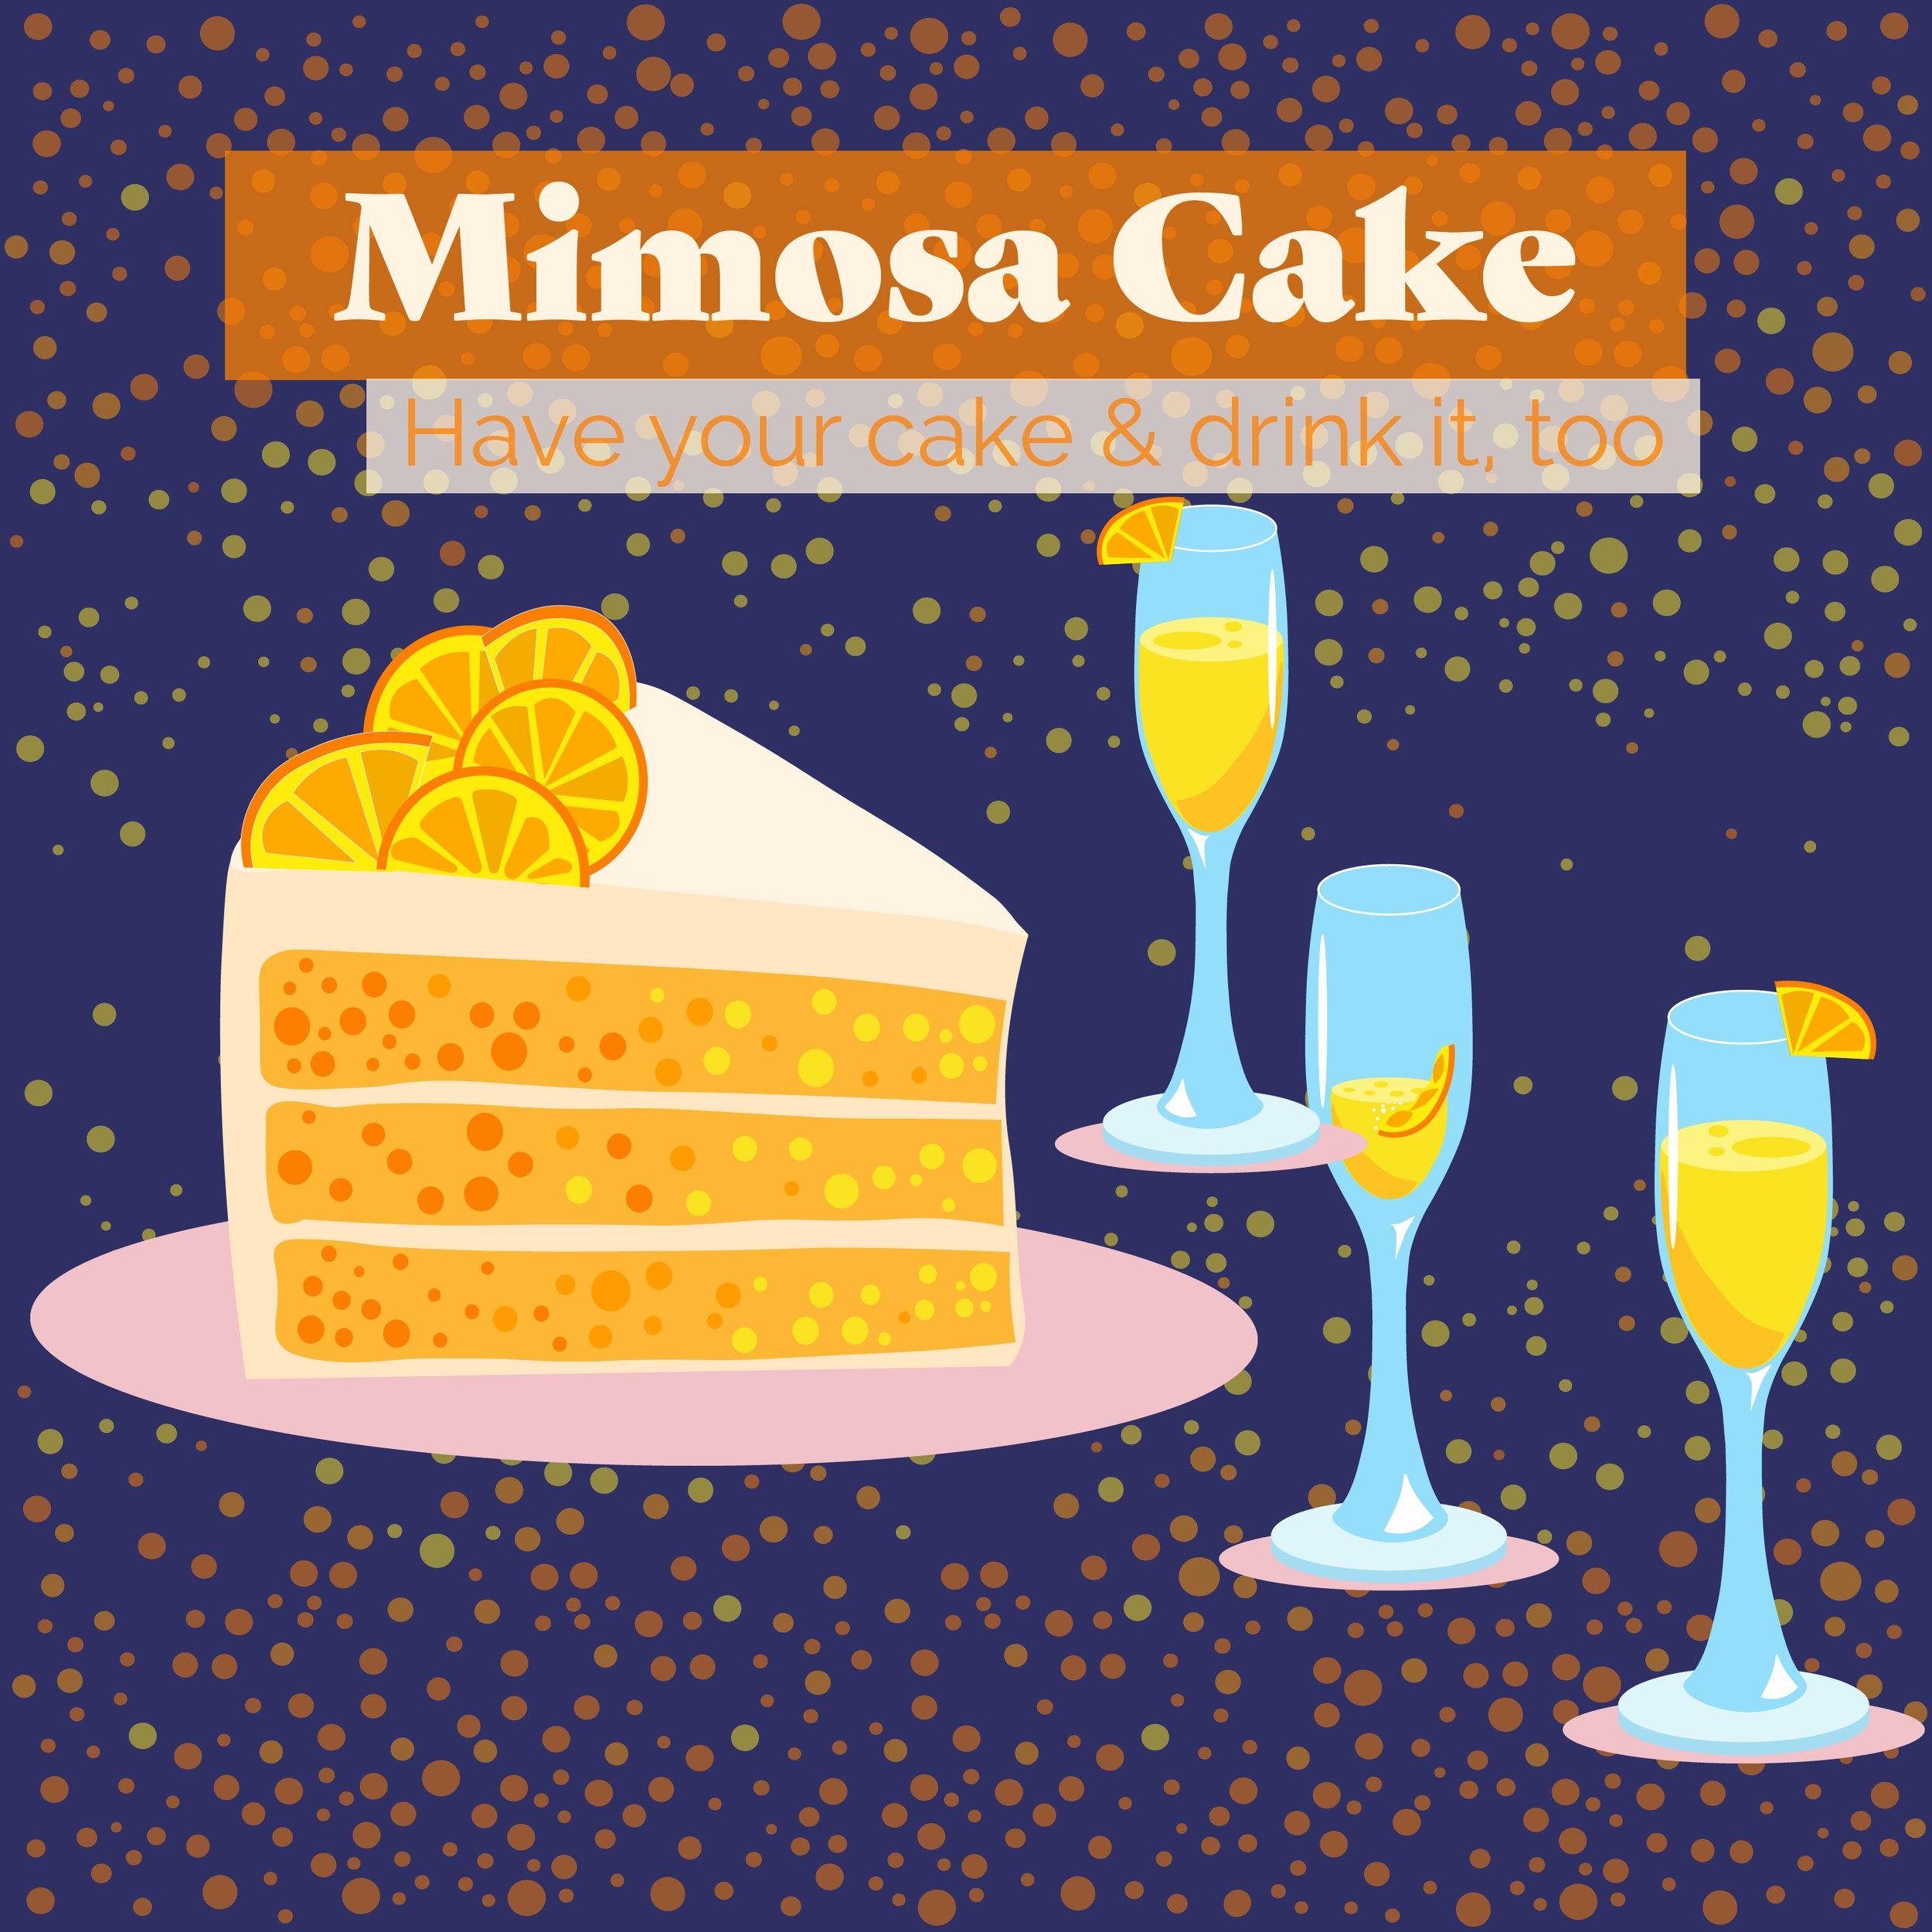 04 Mimosa Cake2.jpg